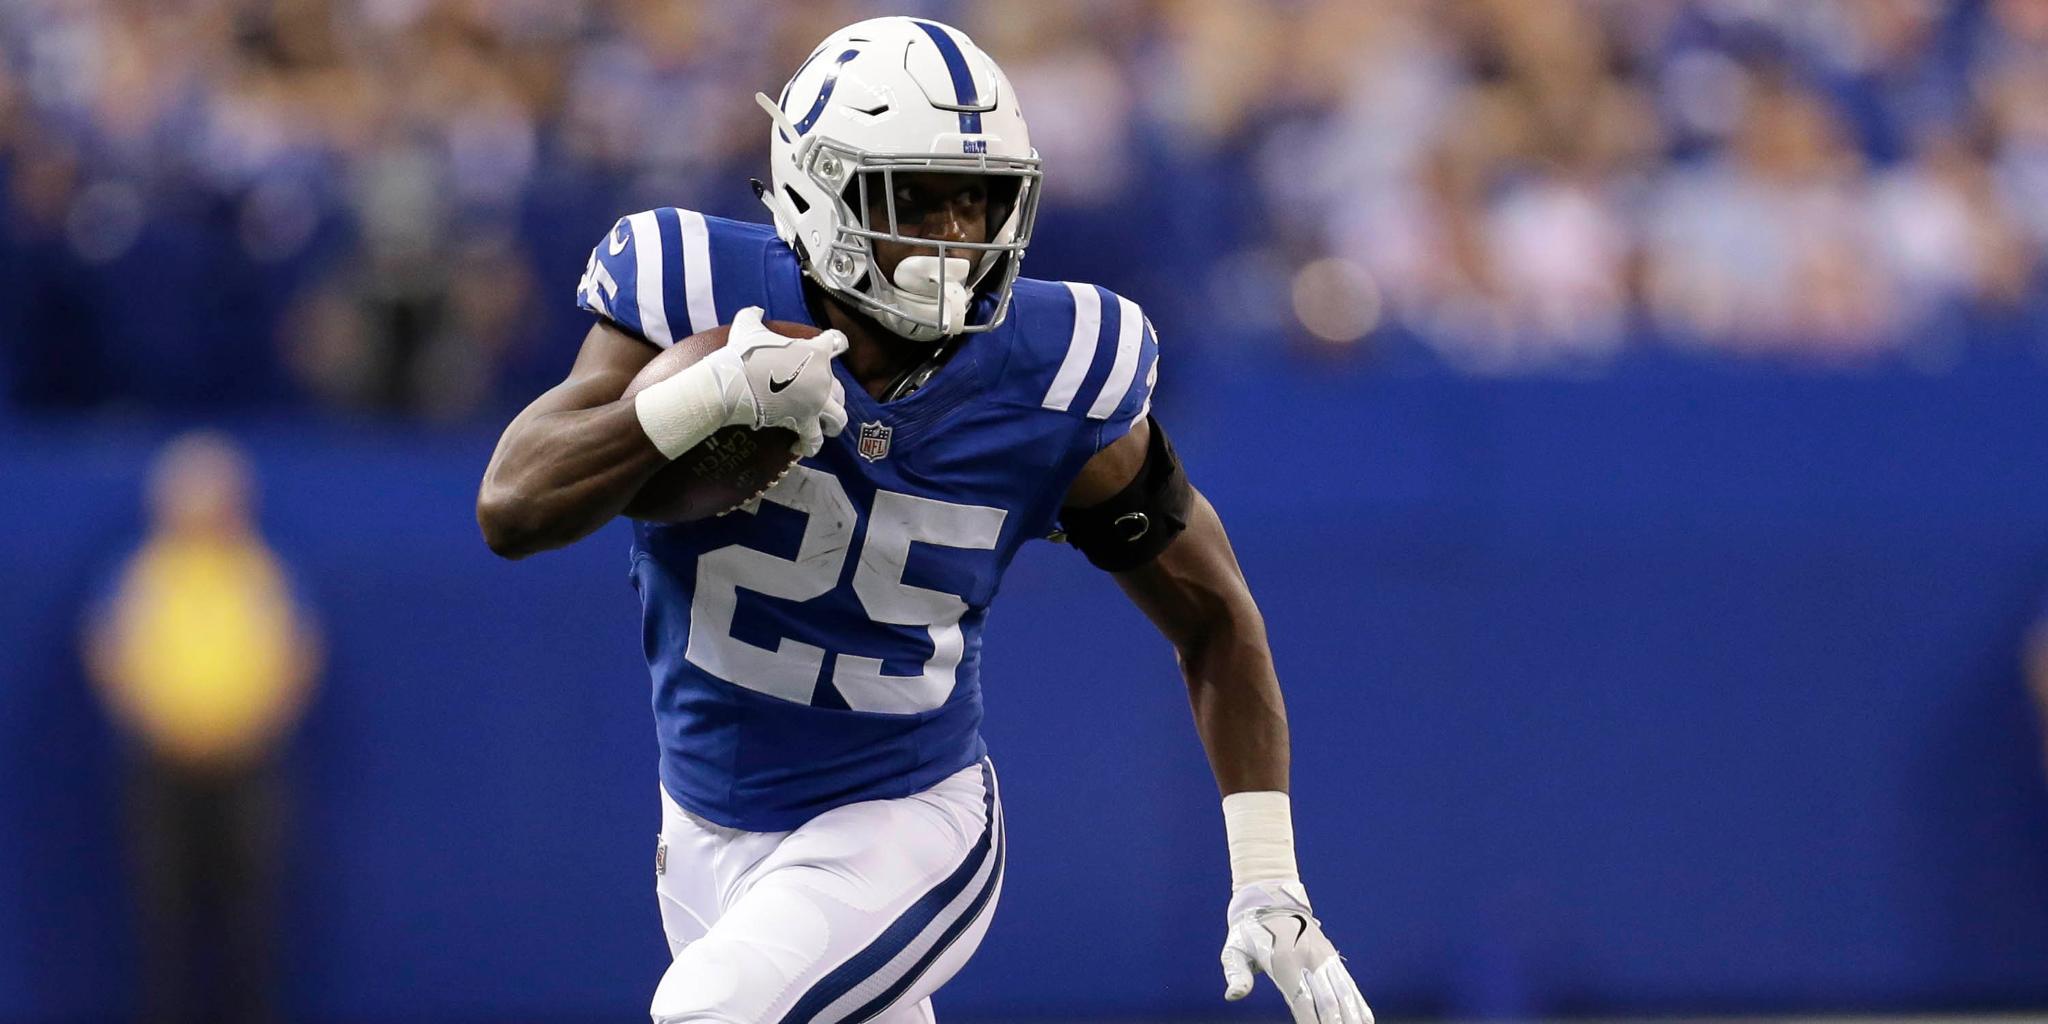 The @Colts next breakout star? https://t.co/5PoUve5yk5 https://t.co/DNAinxCFPq